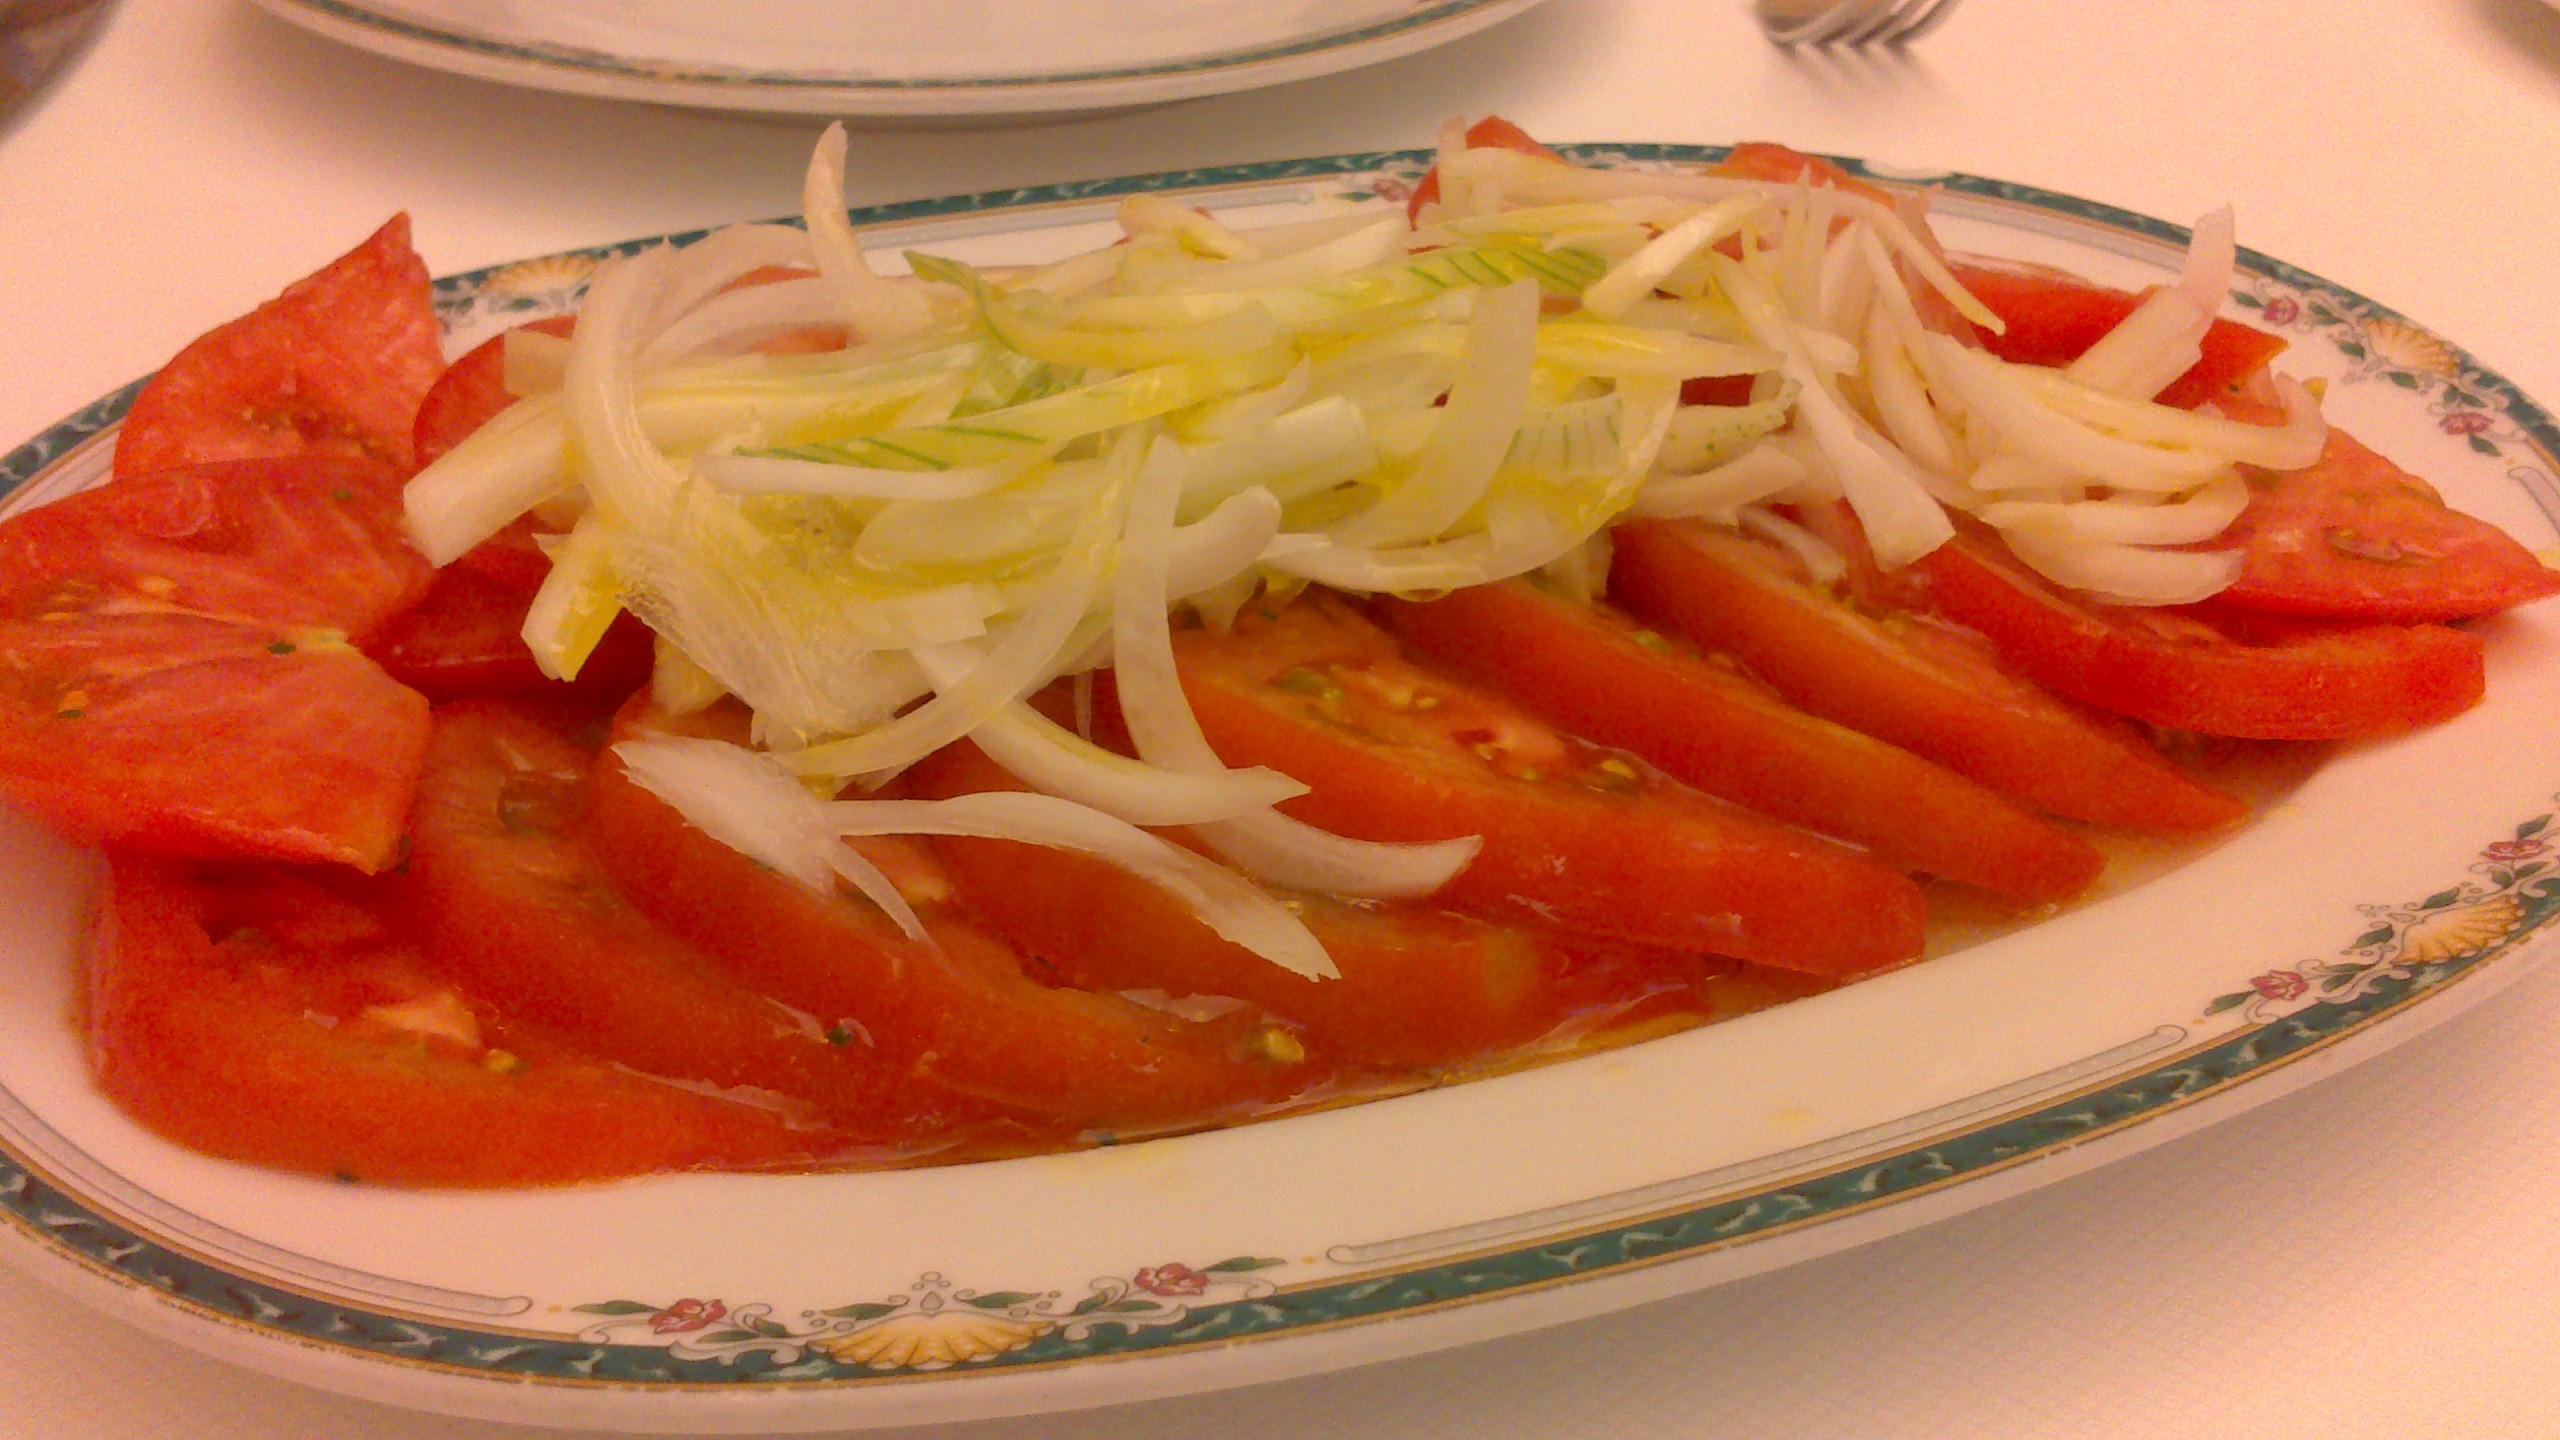 Restaurante Restaurante Trueba (Vizcaya/Bizkaia) Ensalada de tomate